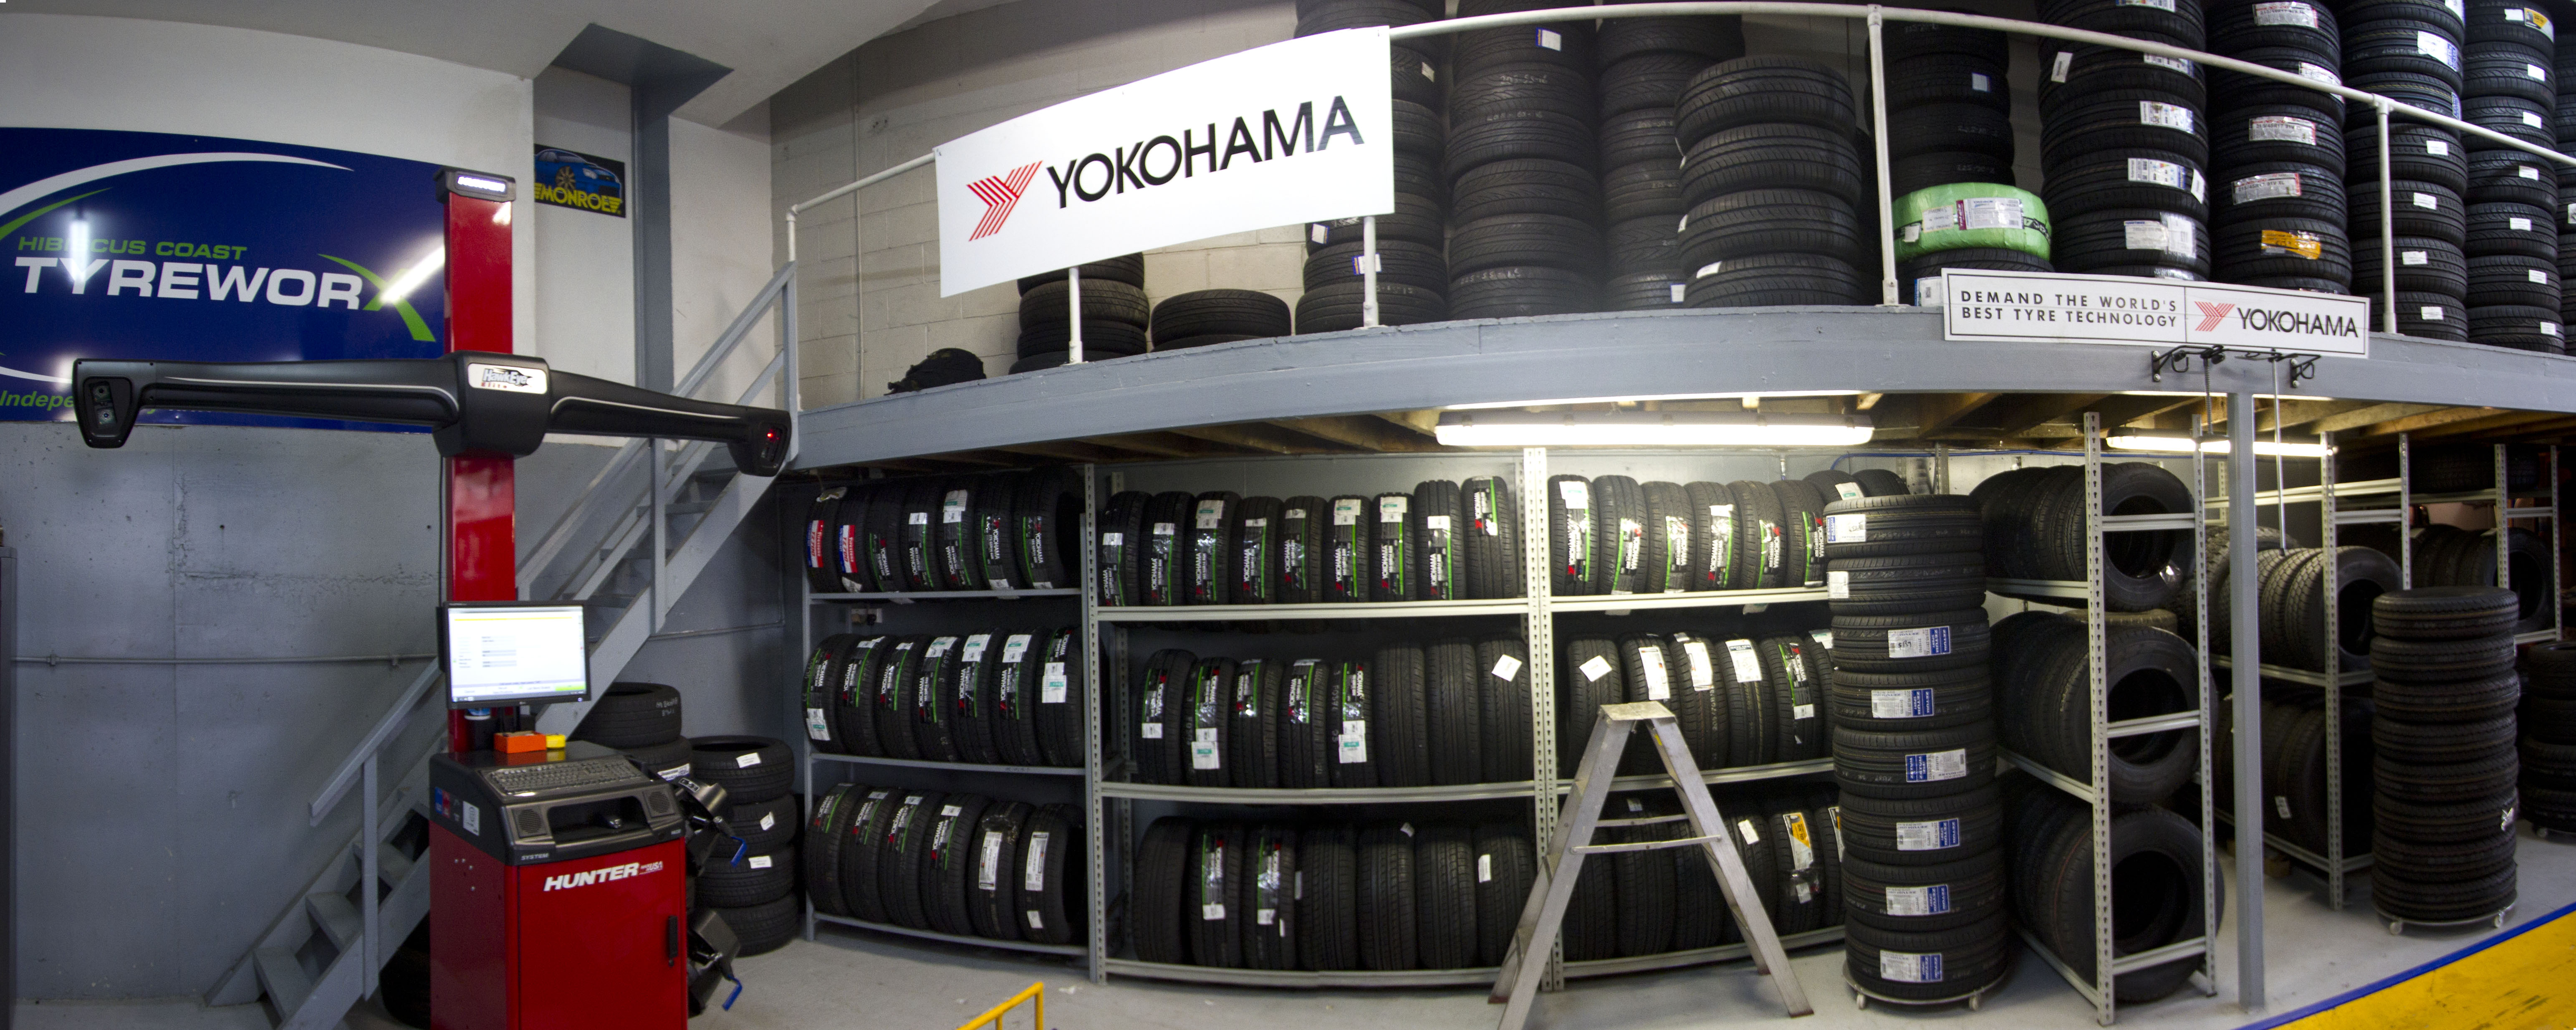 Tyre workshop photo